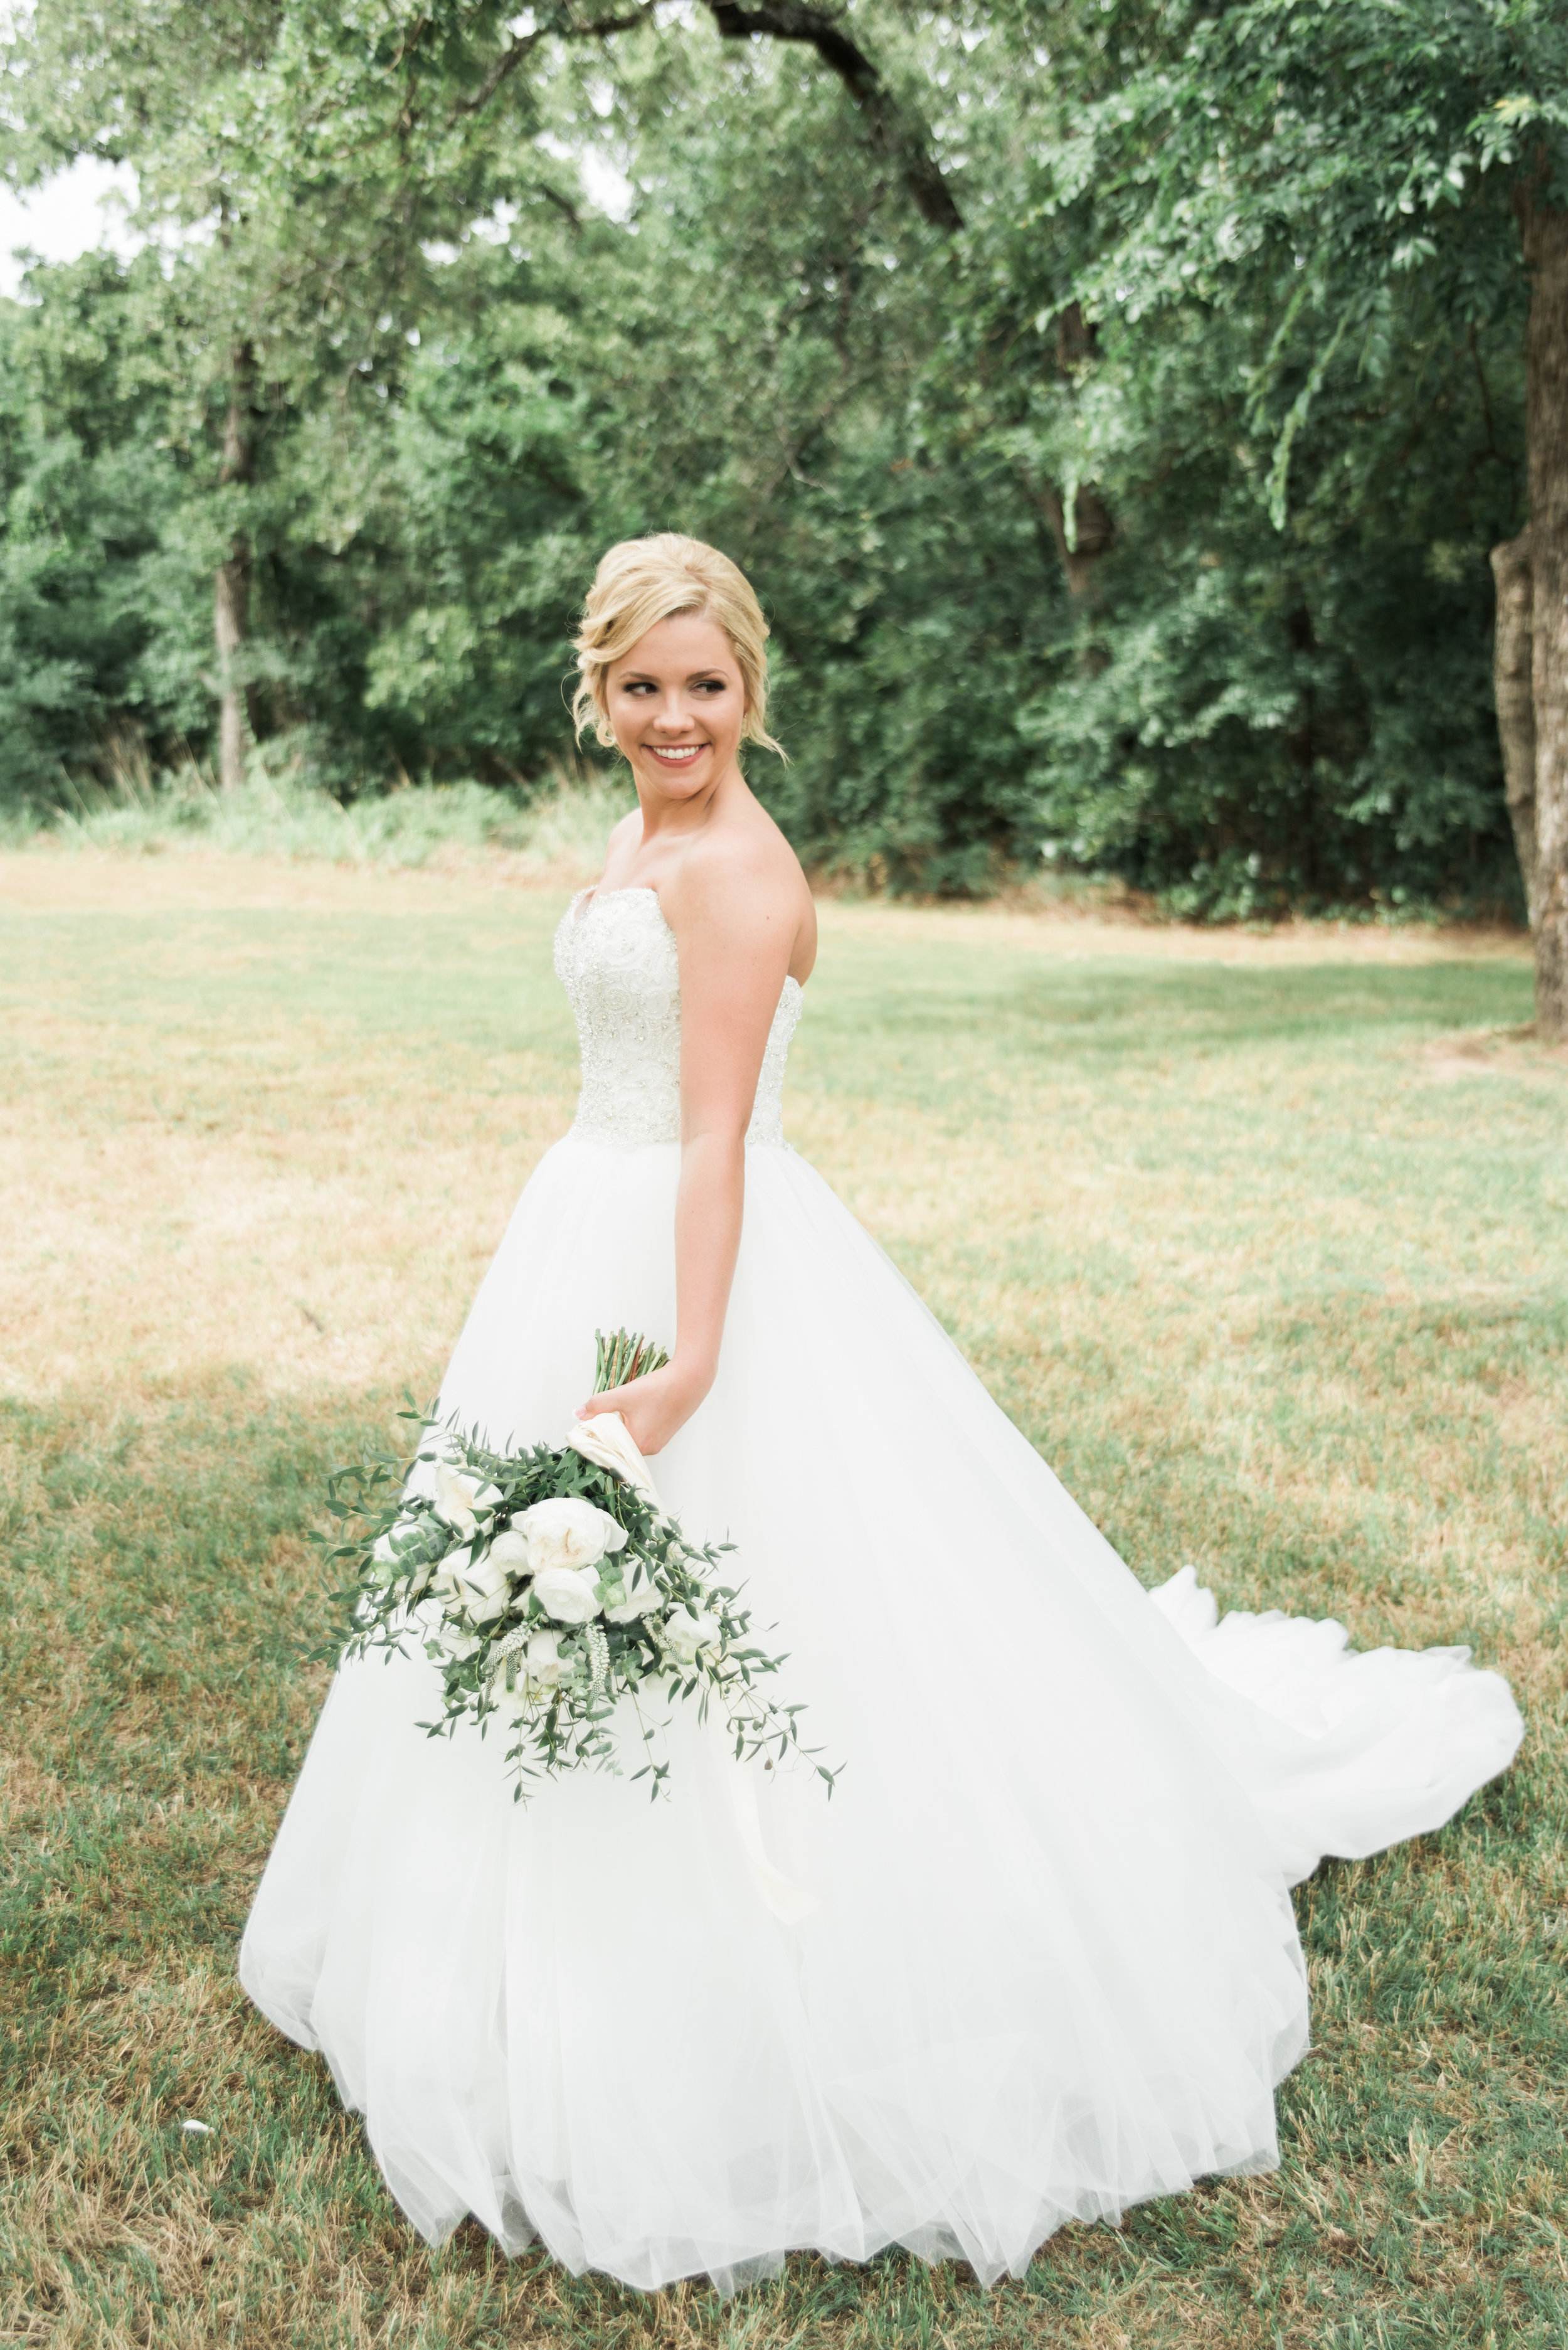 Wiler Weddings